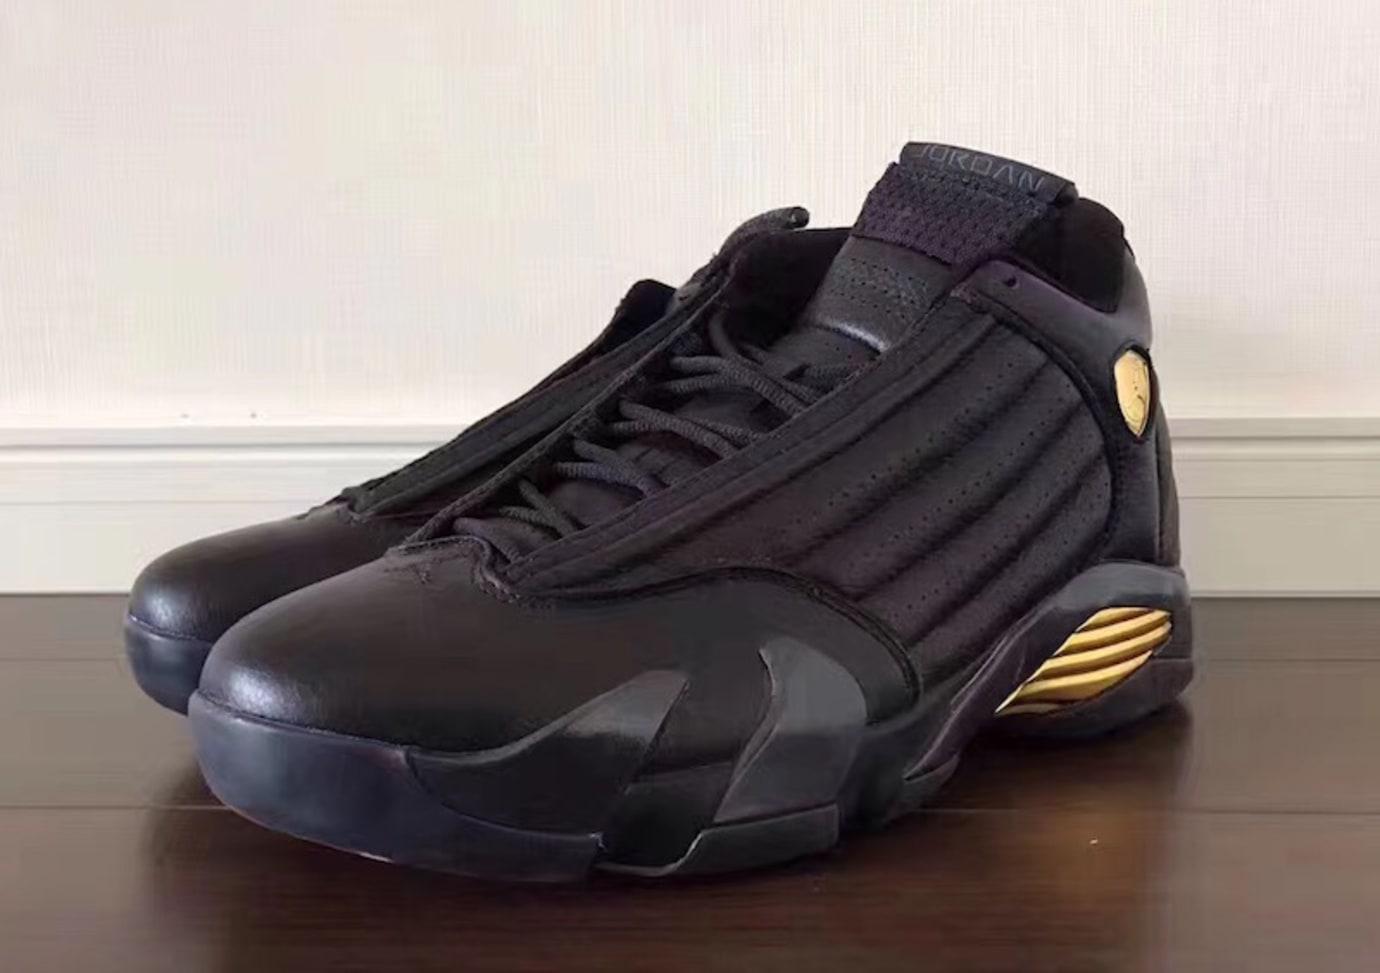 pretty nice fd96e e61a1 Air Jordan 14 Defining Moments Black Gold Release Date 487471-022 (2)